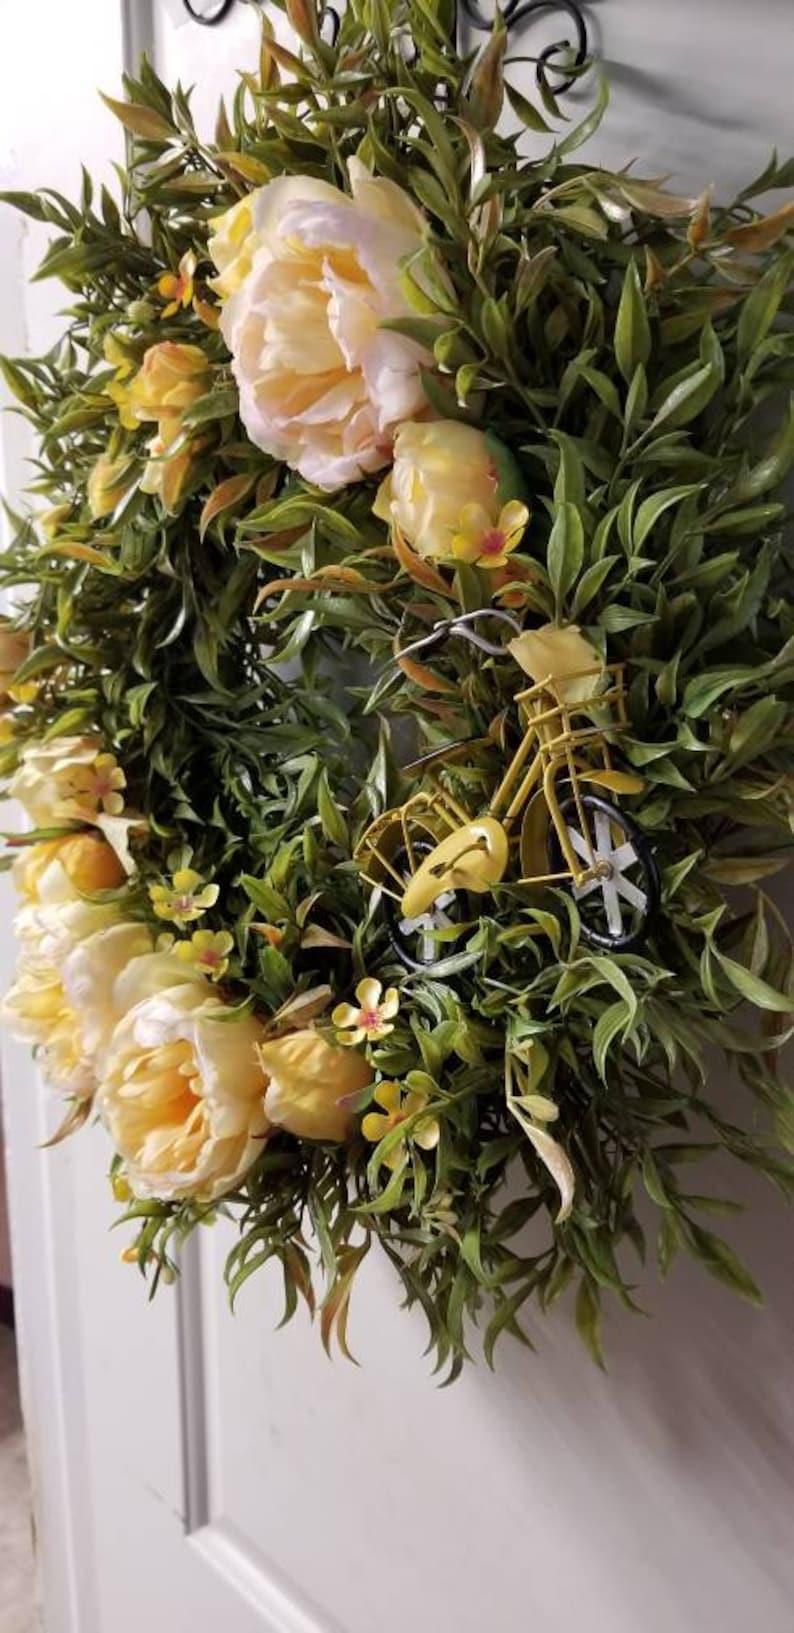 Bicycle Wreath Peony Fern Wreath Yellow Wreath Bicycle Frontdoor Beach Cruiser Summer Wreath door wreath Peony Wreath Peonies